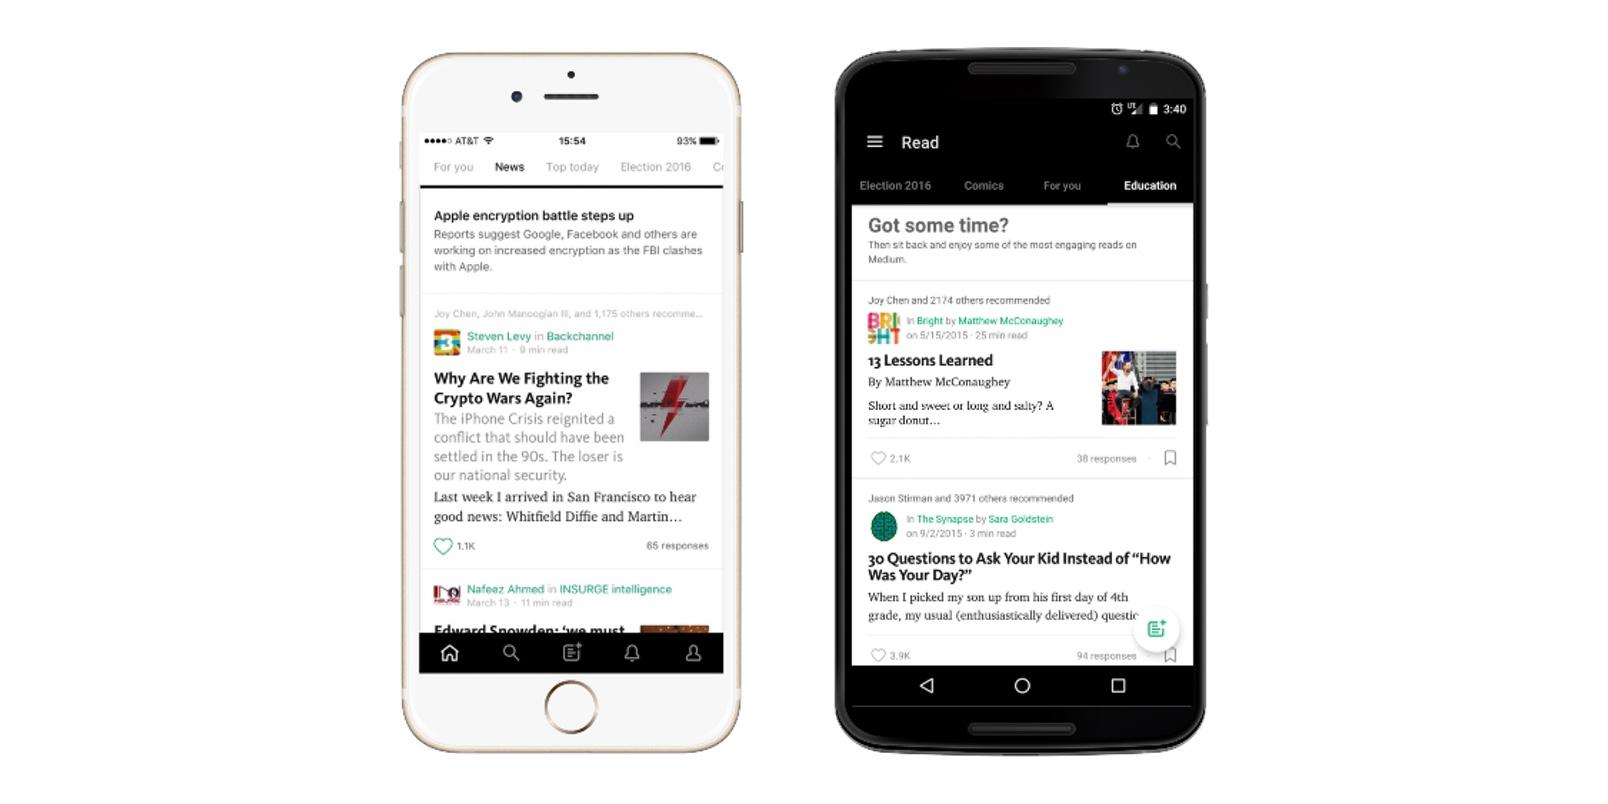 Medium is now curating popular articles